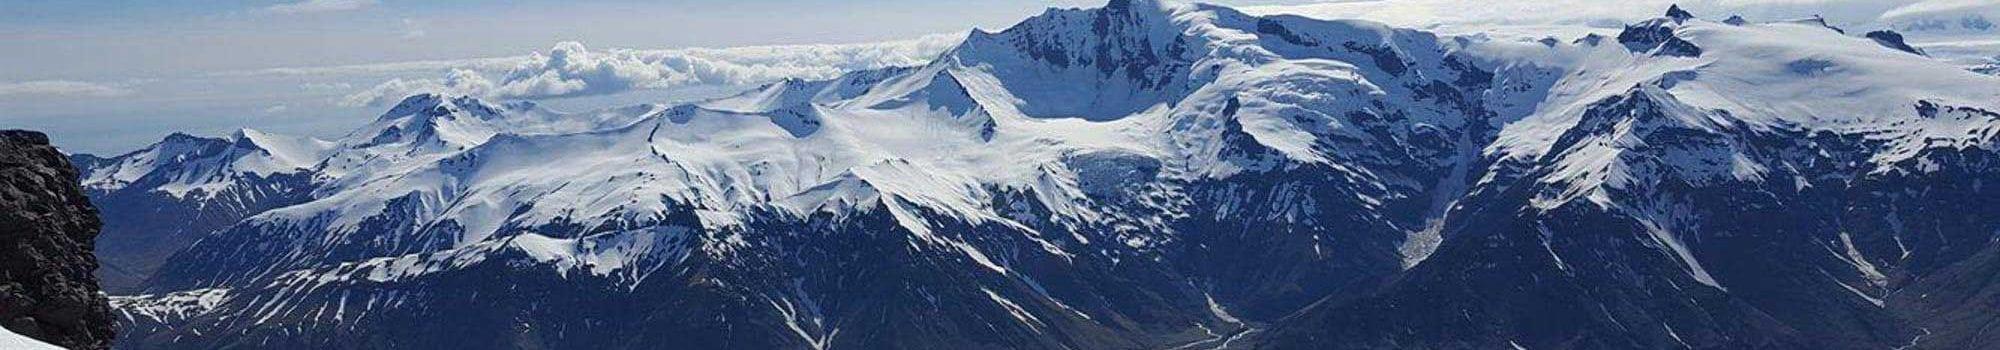 Vatnajokull Glacier View